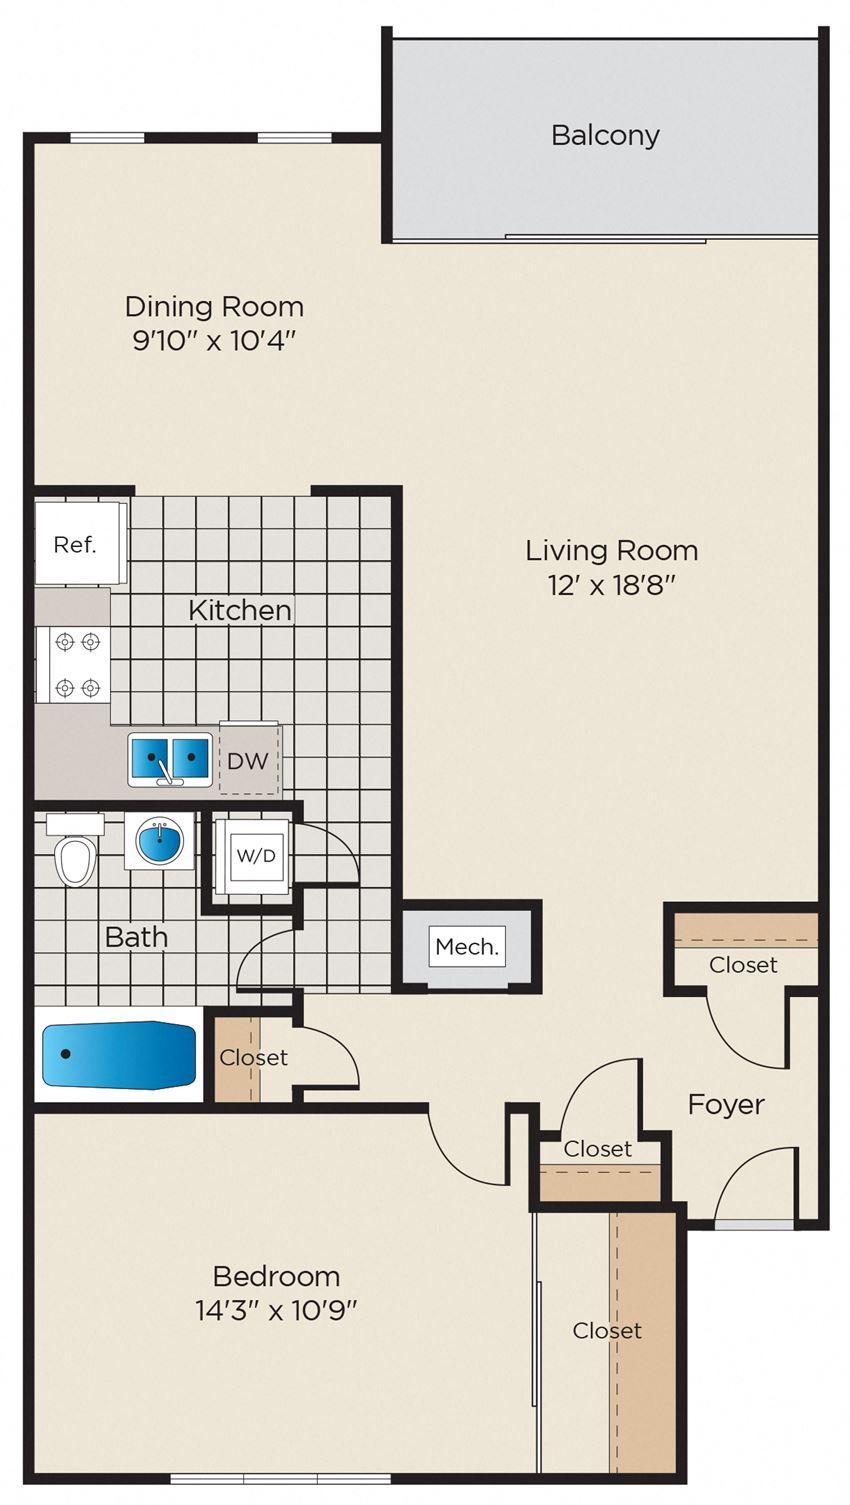 1 Bedroom - Upgraded